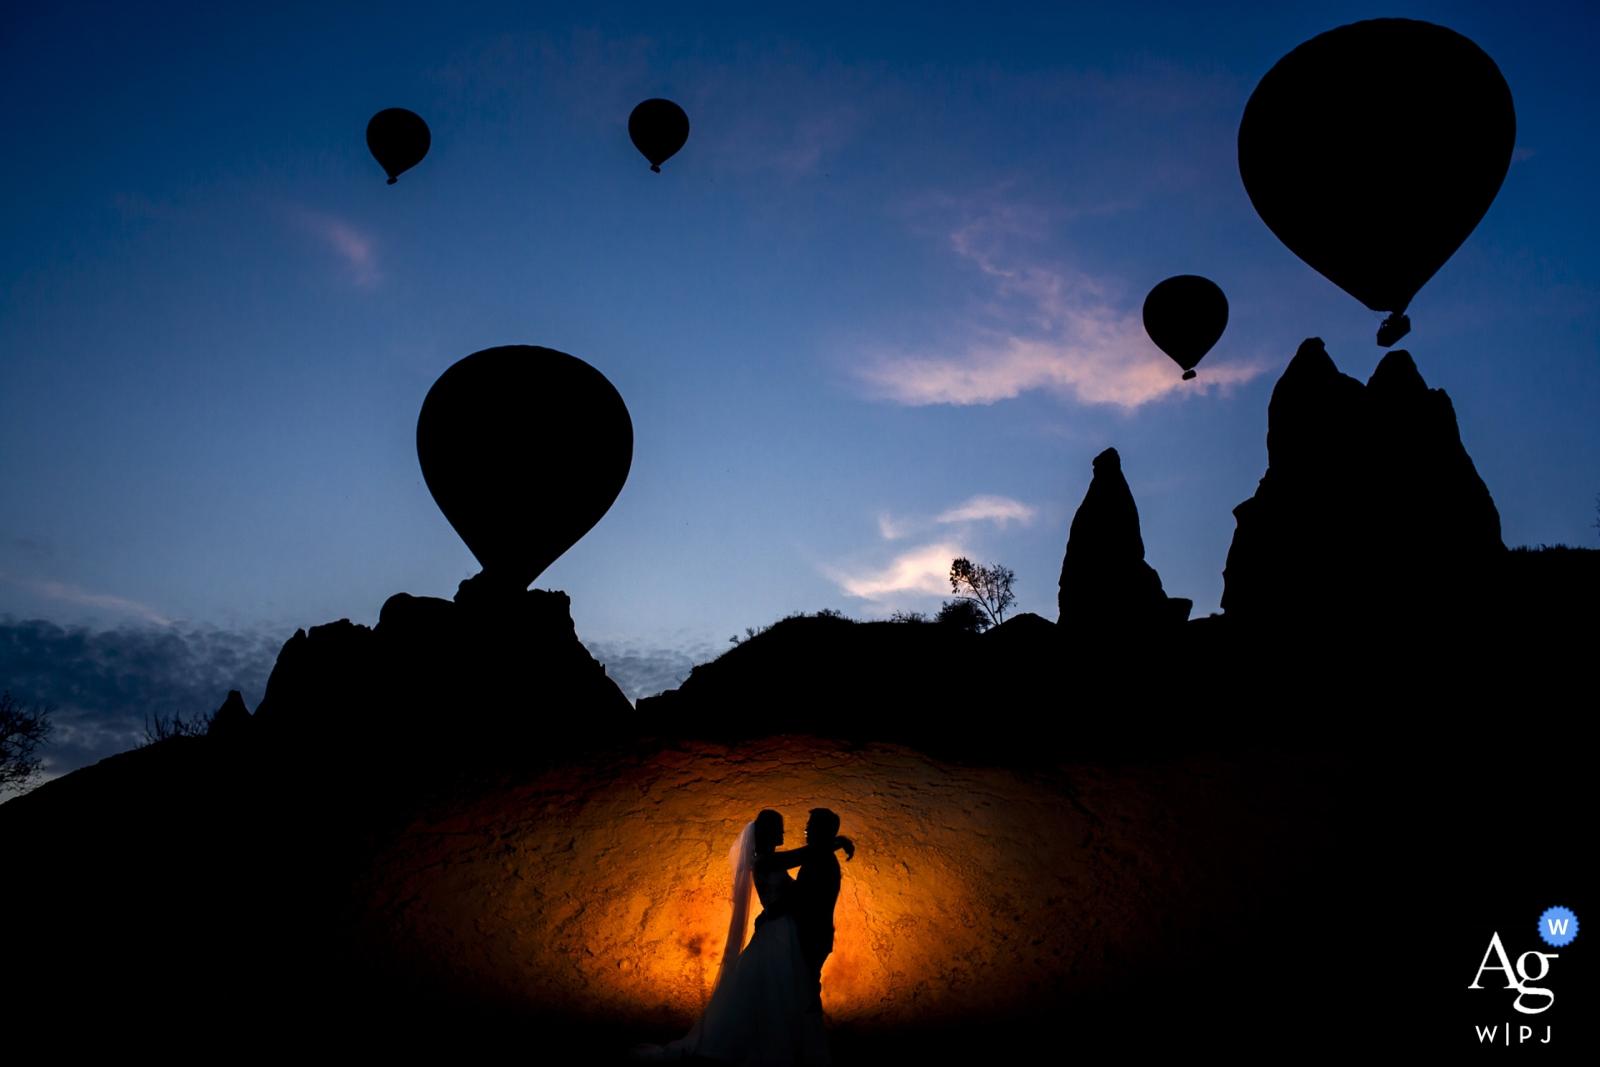 cappadocia, kaya hotel wedding venue photography - portrait of couple shooting at cappadocia